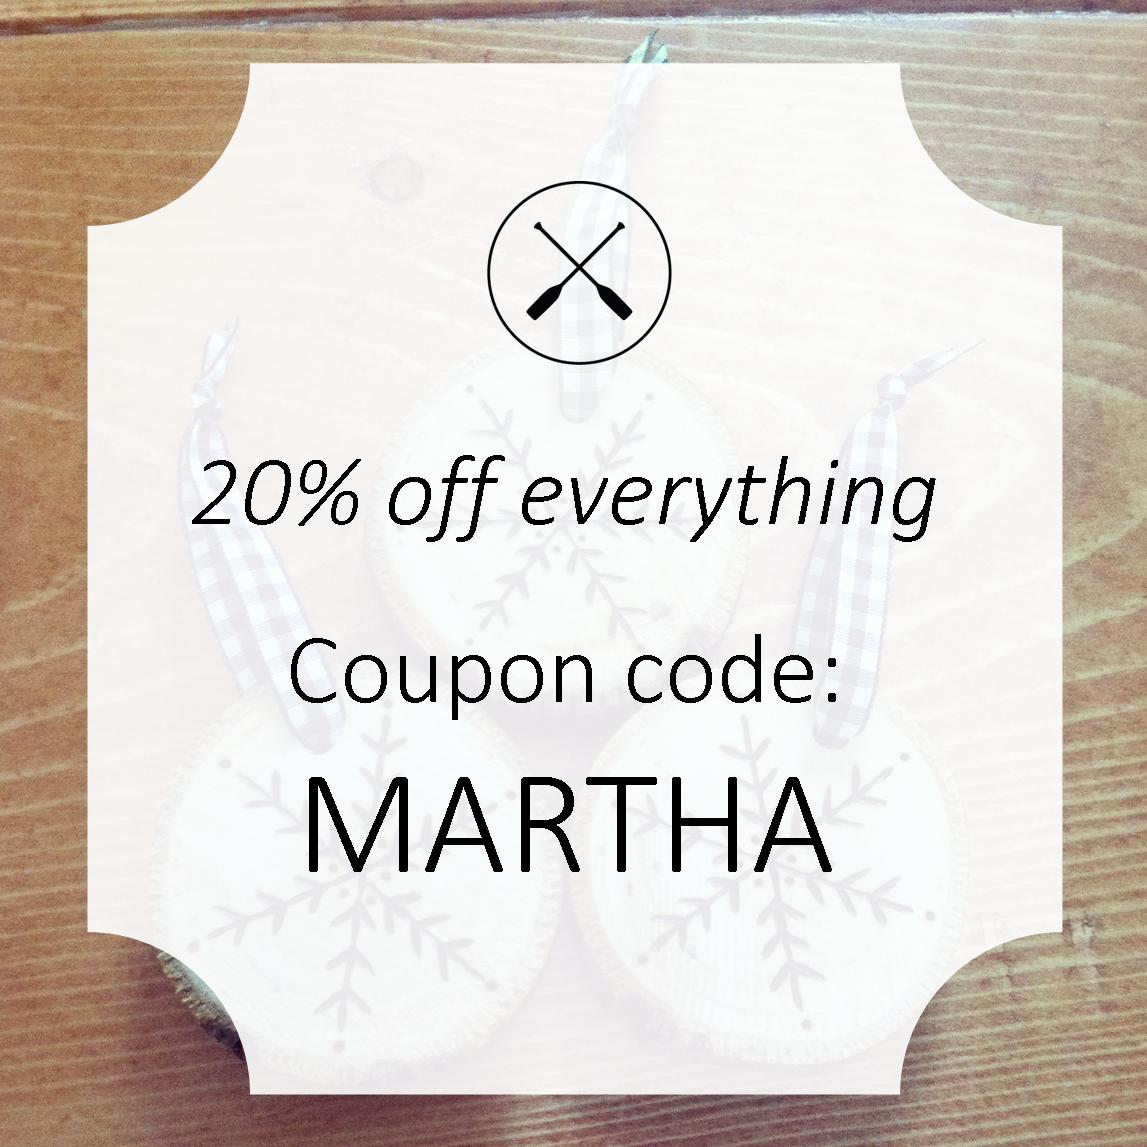 Coupon code expires 11/24/14.